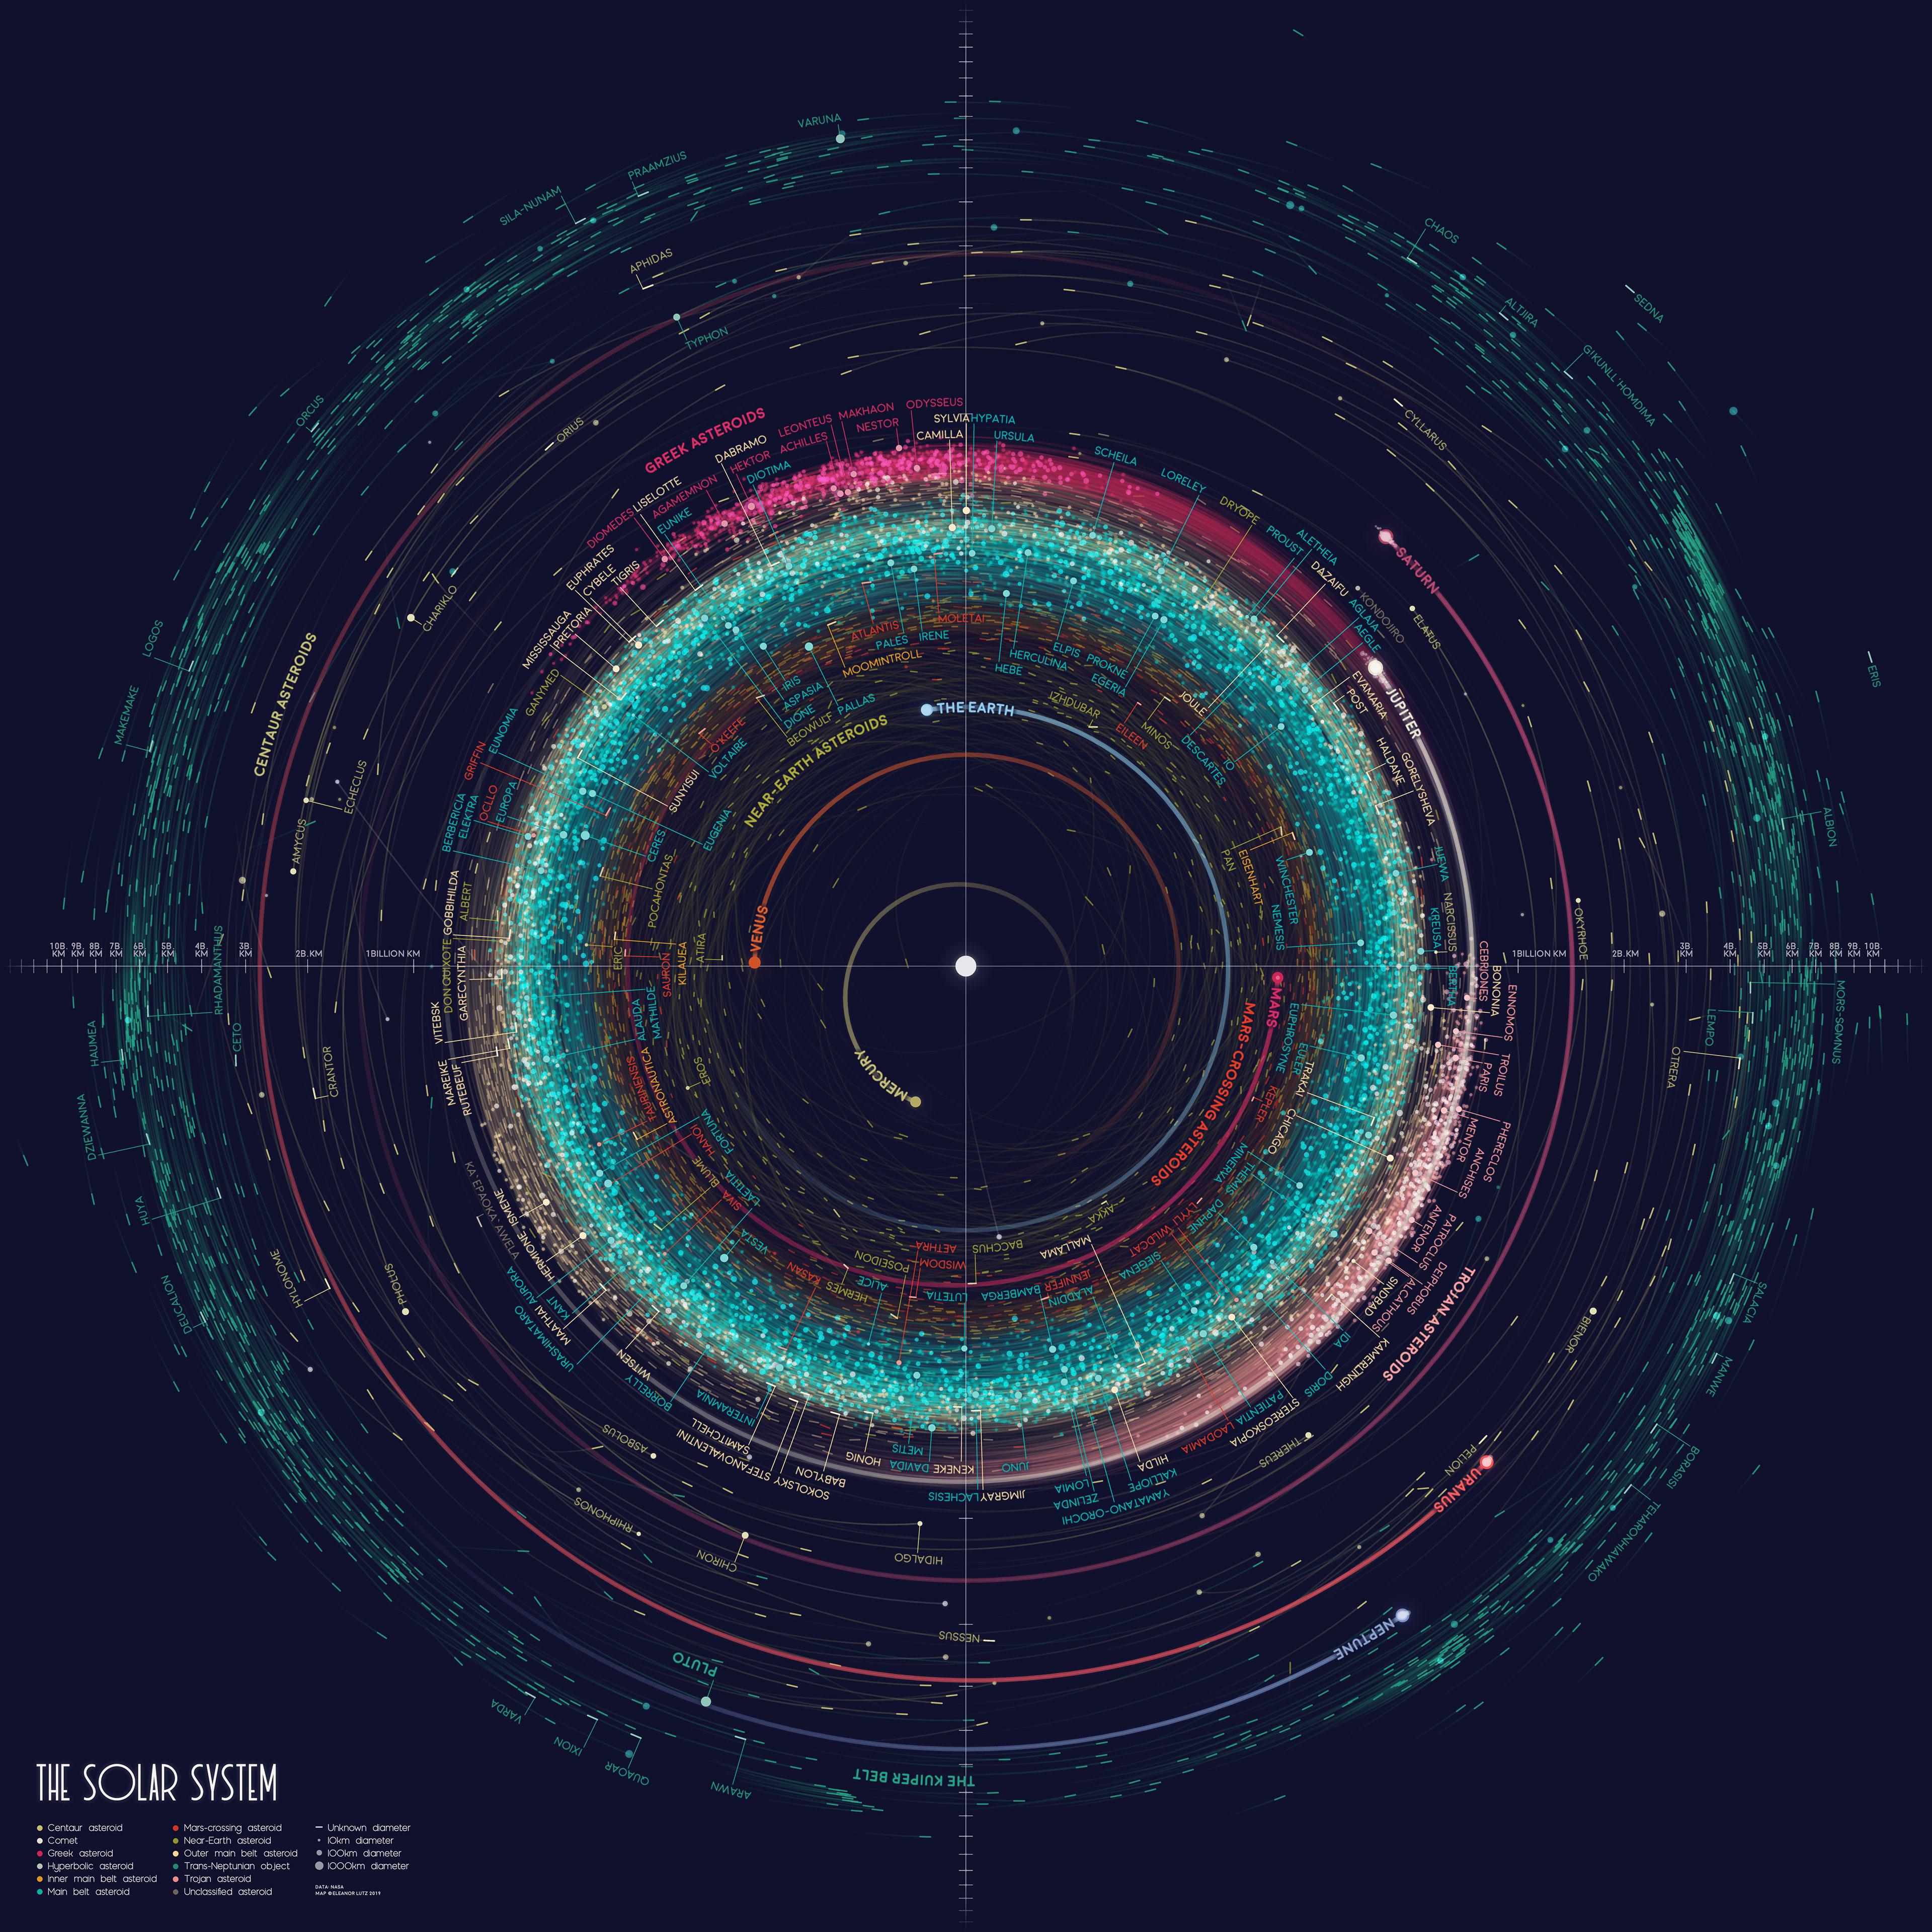 https://mossandfog.com/wp-content/uploads/2020/06/Full-Size-solar-system-infographic.jpg